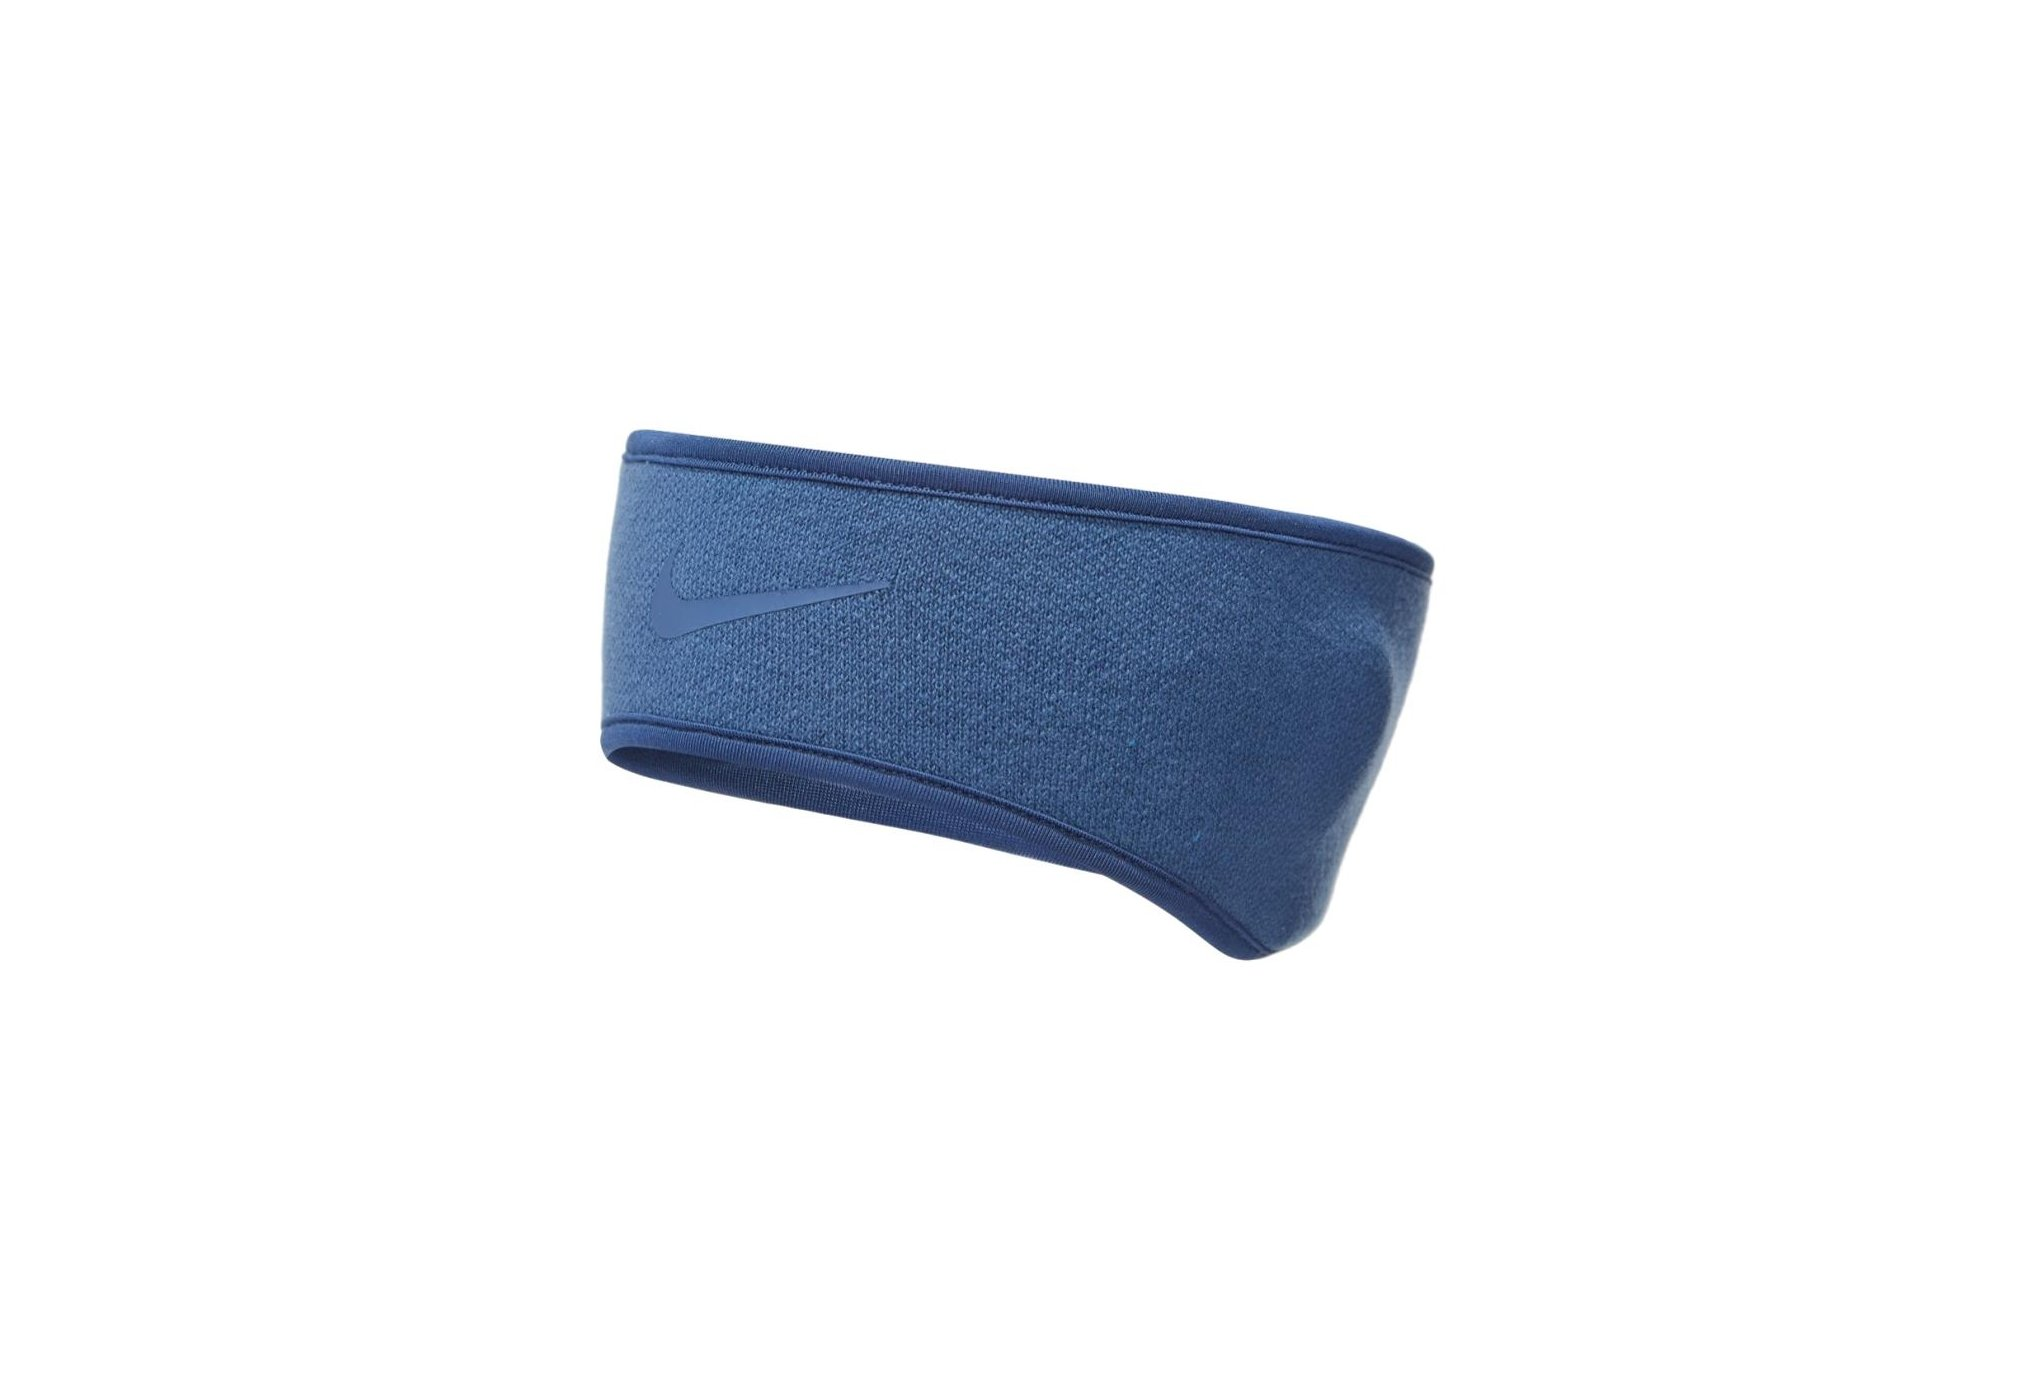 Nike Fleece Headband Casquettes / bandeaux